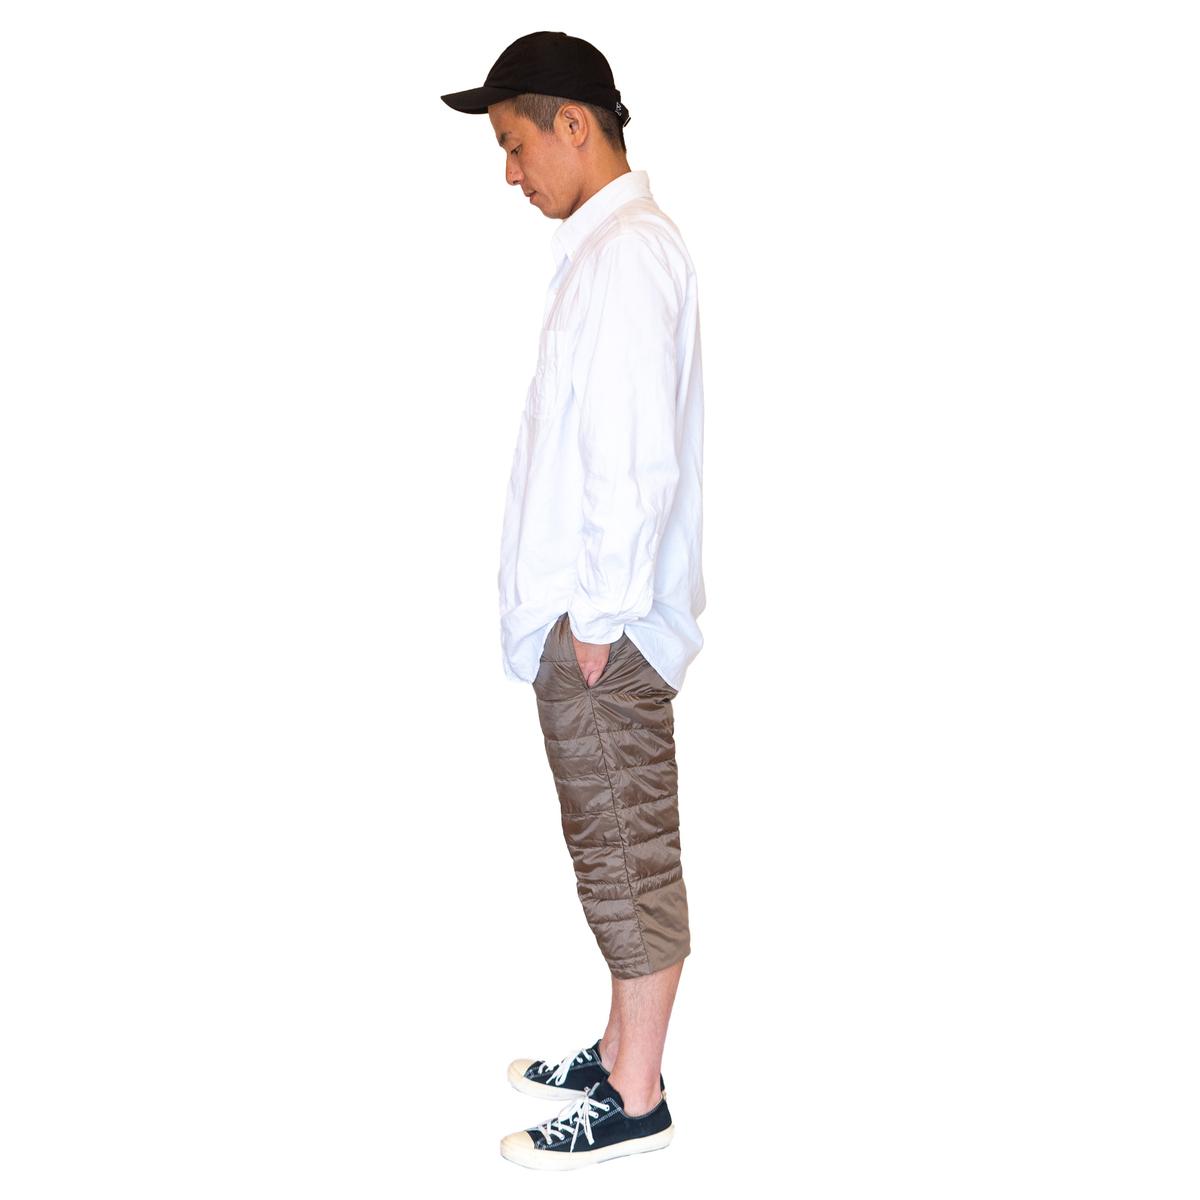 f:id:yamada0221:20210816113054j:plain